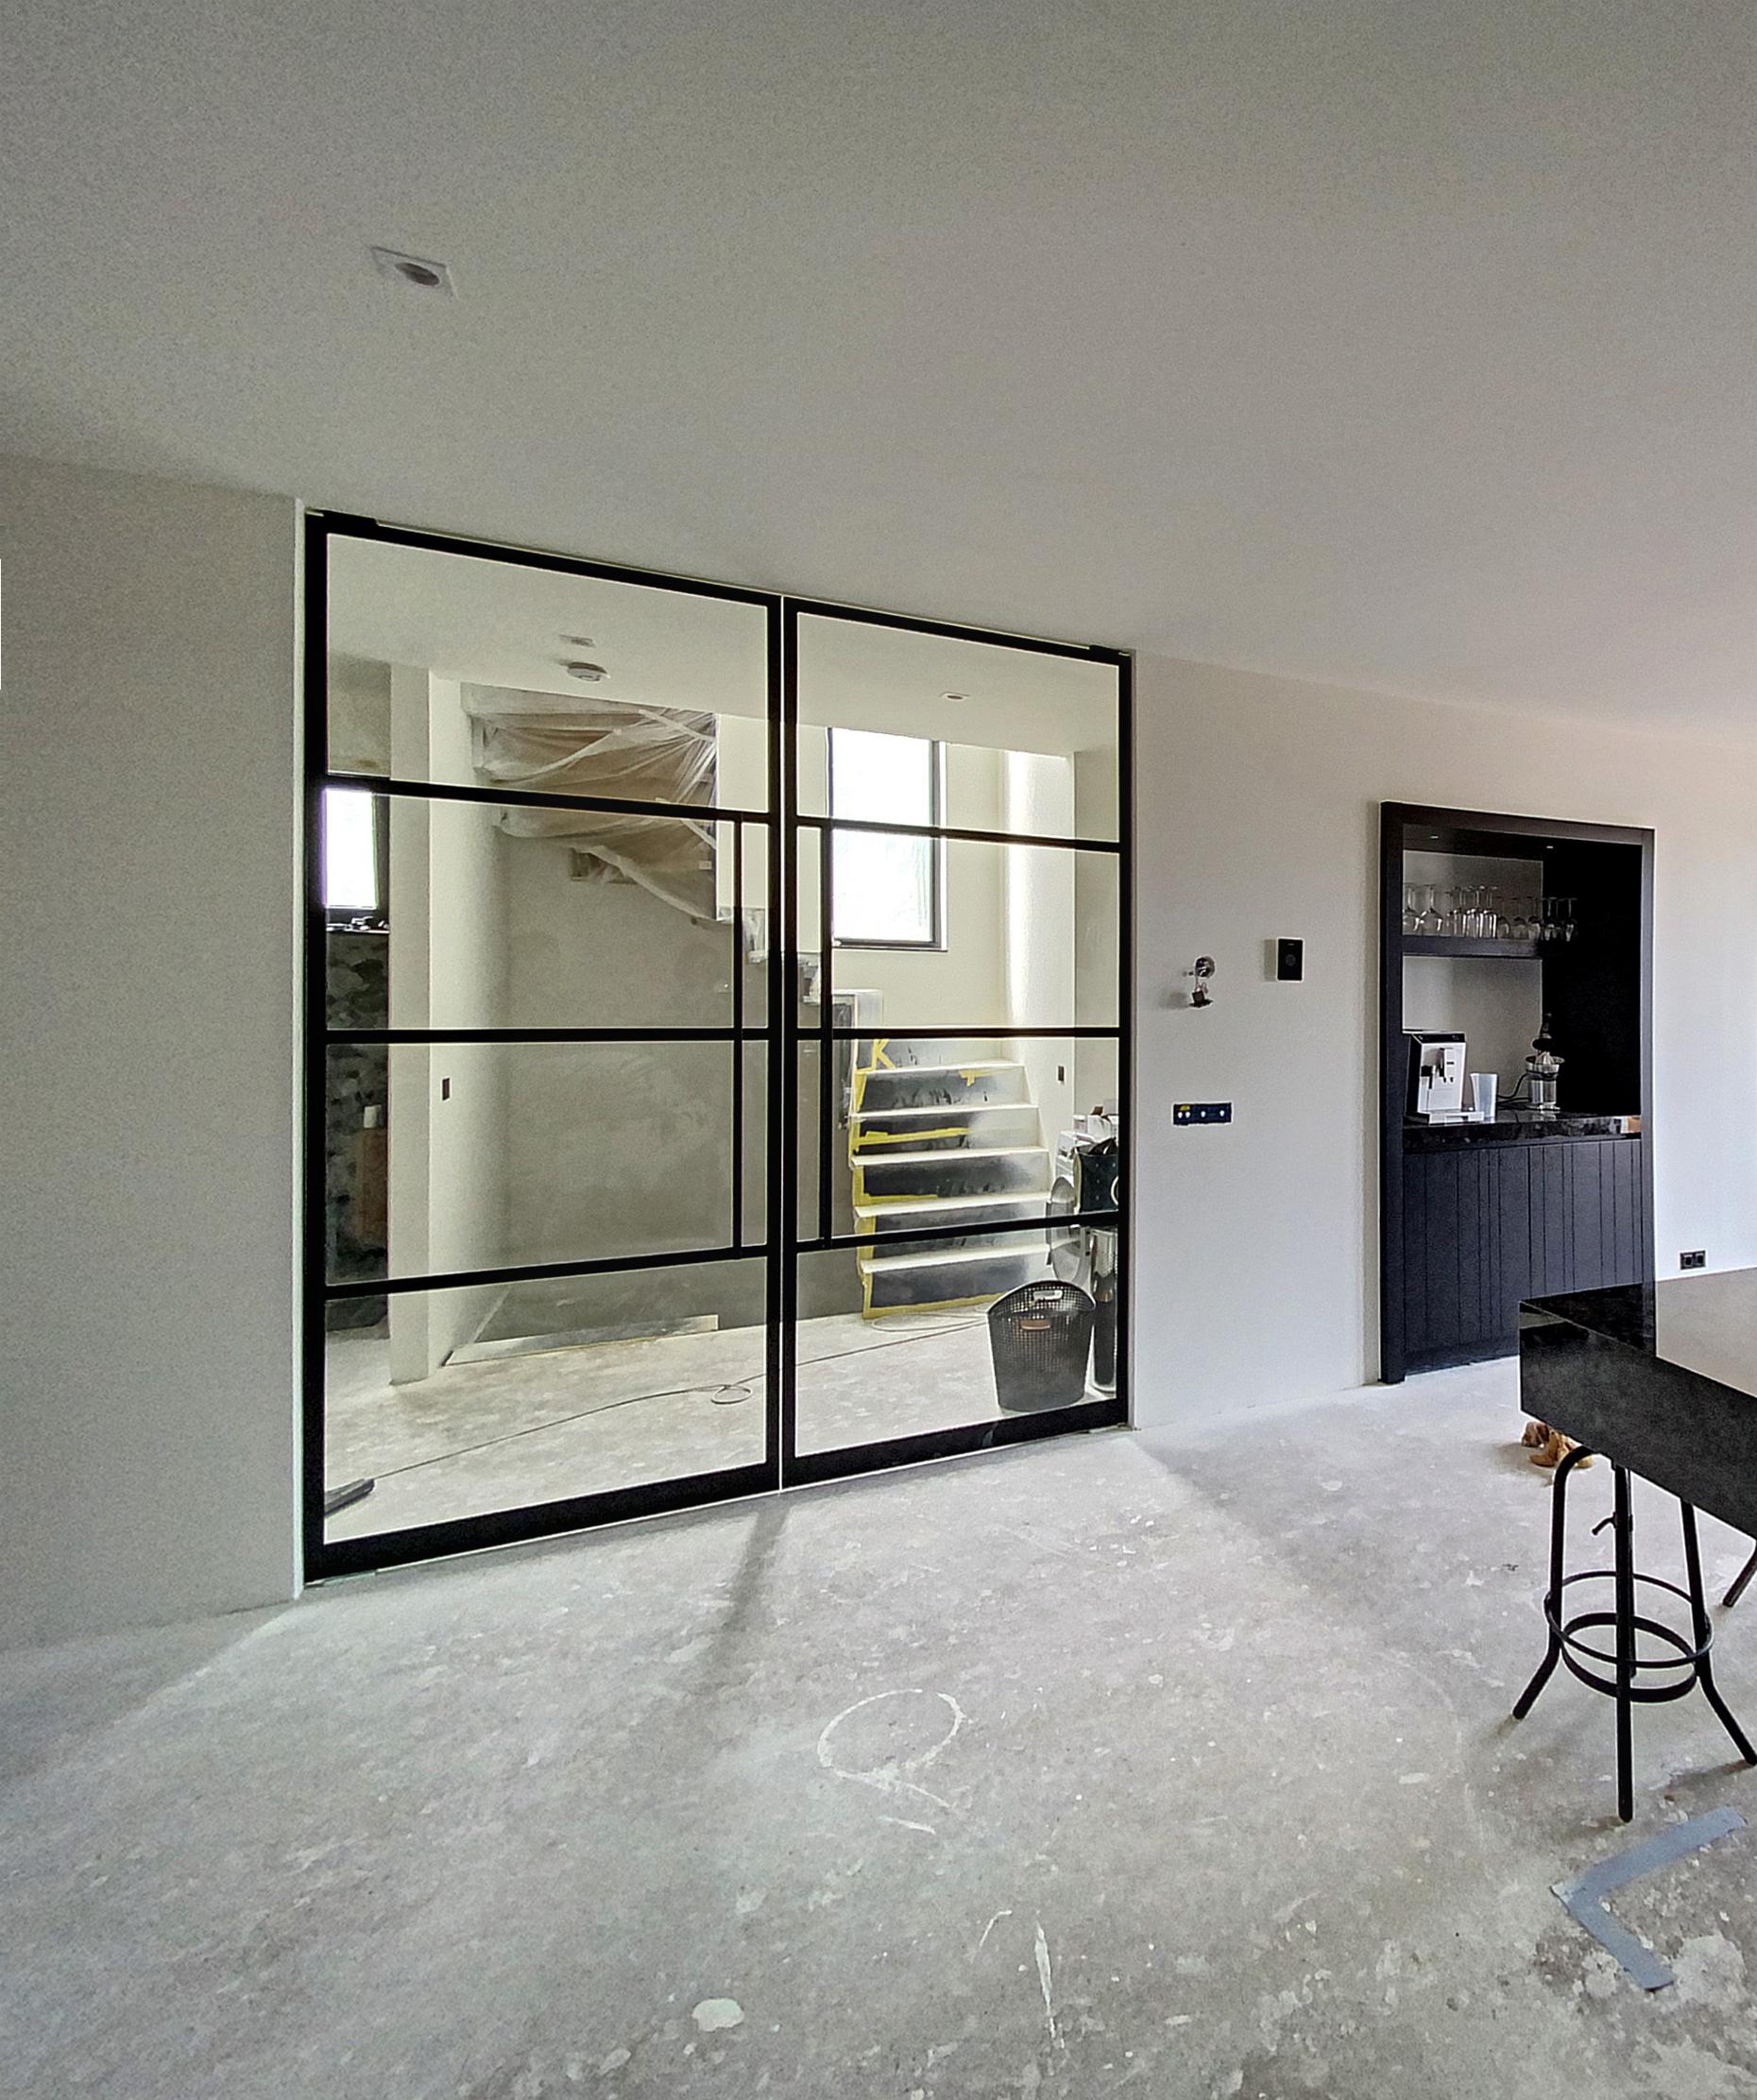 nieuwbouw-winkelpand-met-bovenwoning-architect-breda-8